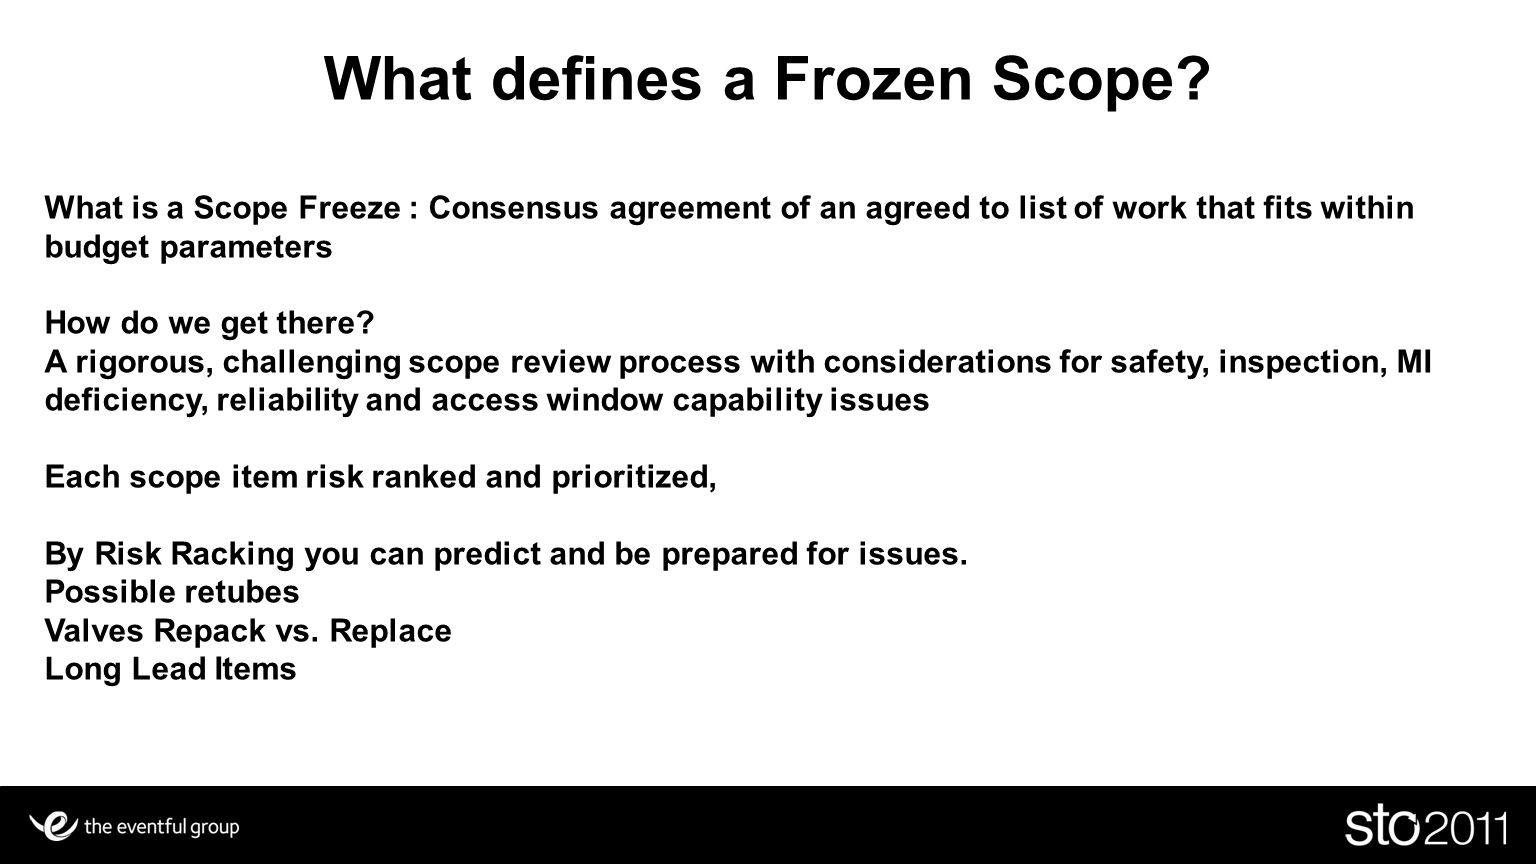 What defines a Frozen Scope